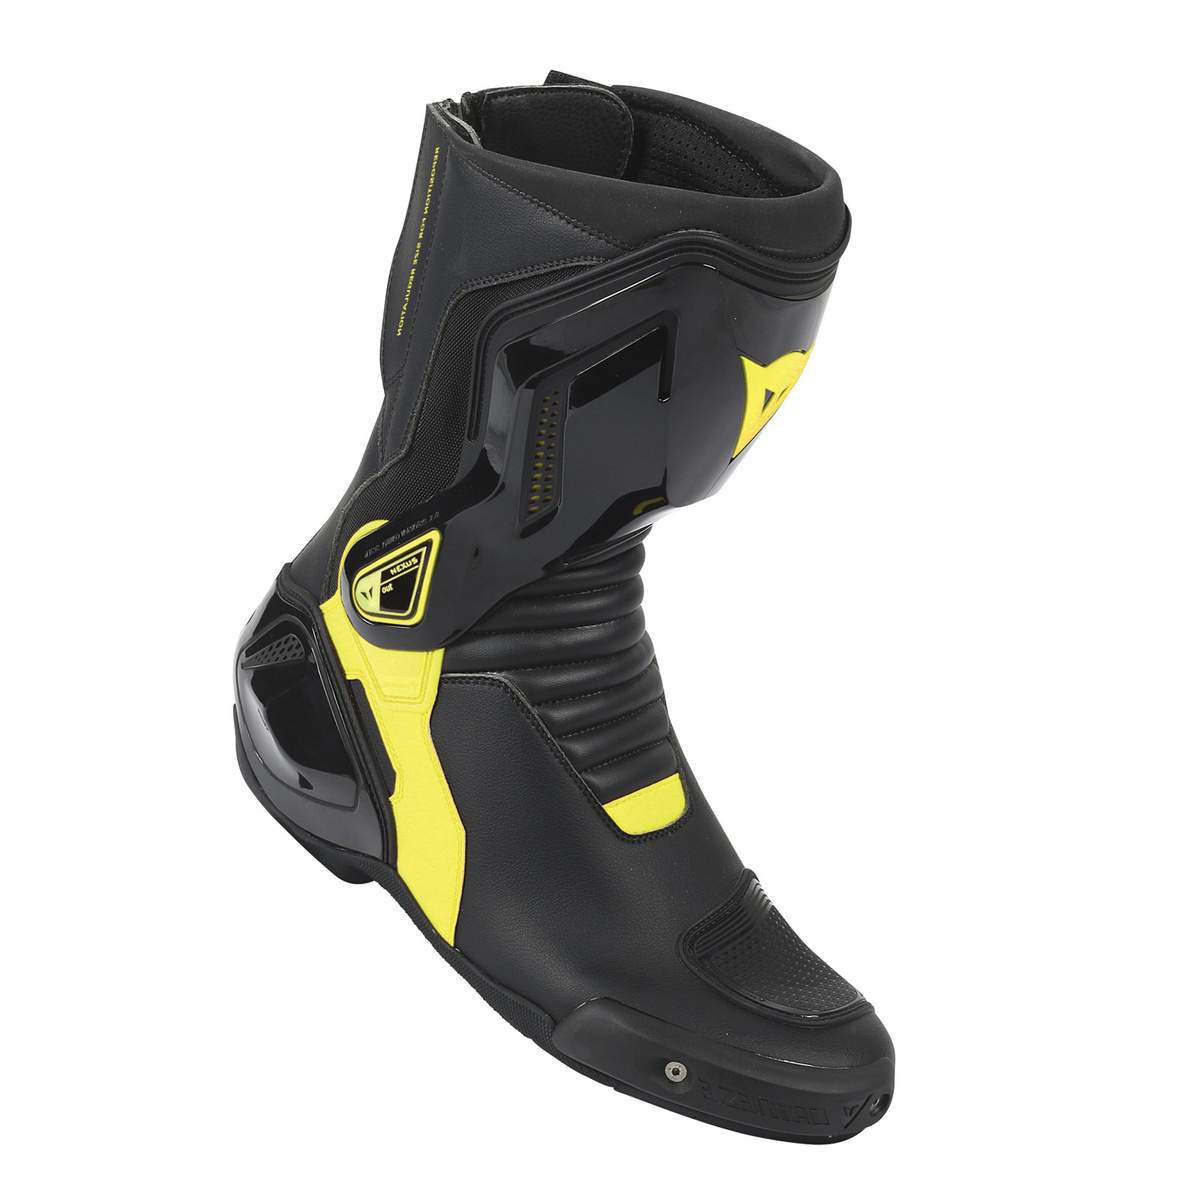 Dainese nexus nero  giallo fluo stivali - Moto Charlie 7503baeaf7d